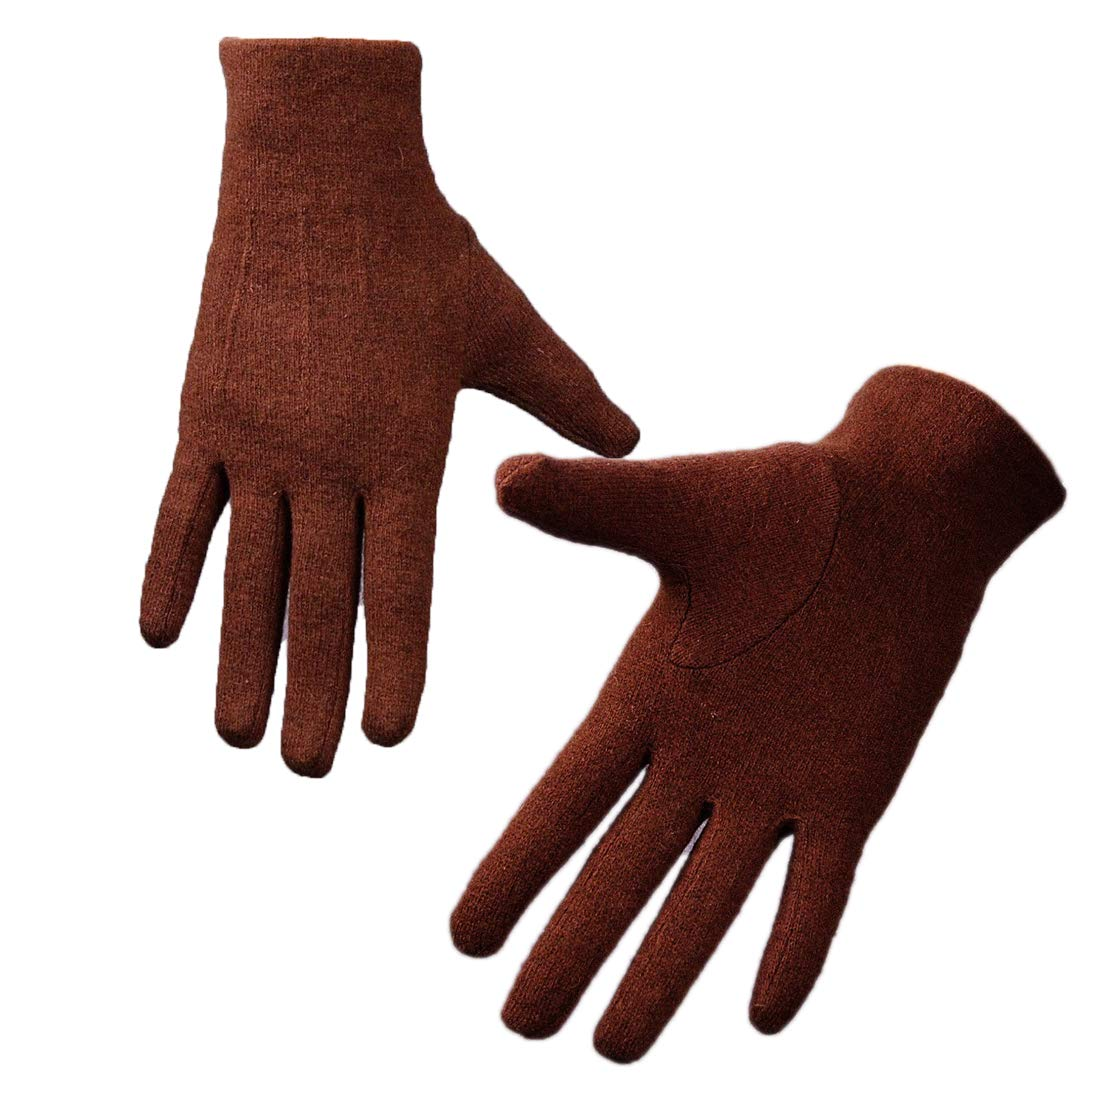 Wool Gloves Knitting Unisex Basic Minimal Handmade Winter (Gray)